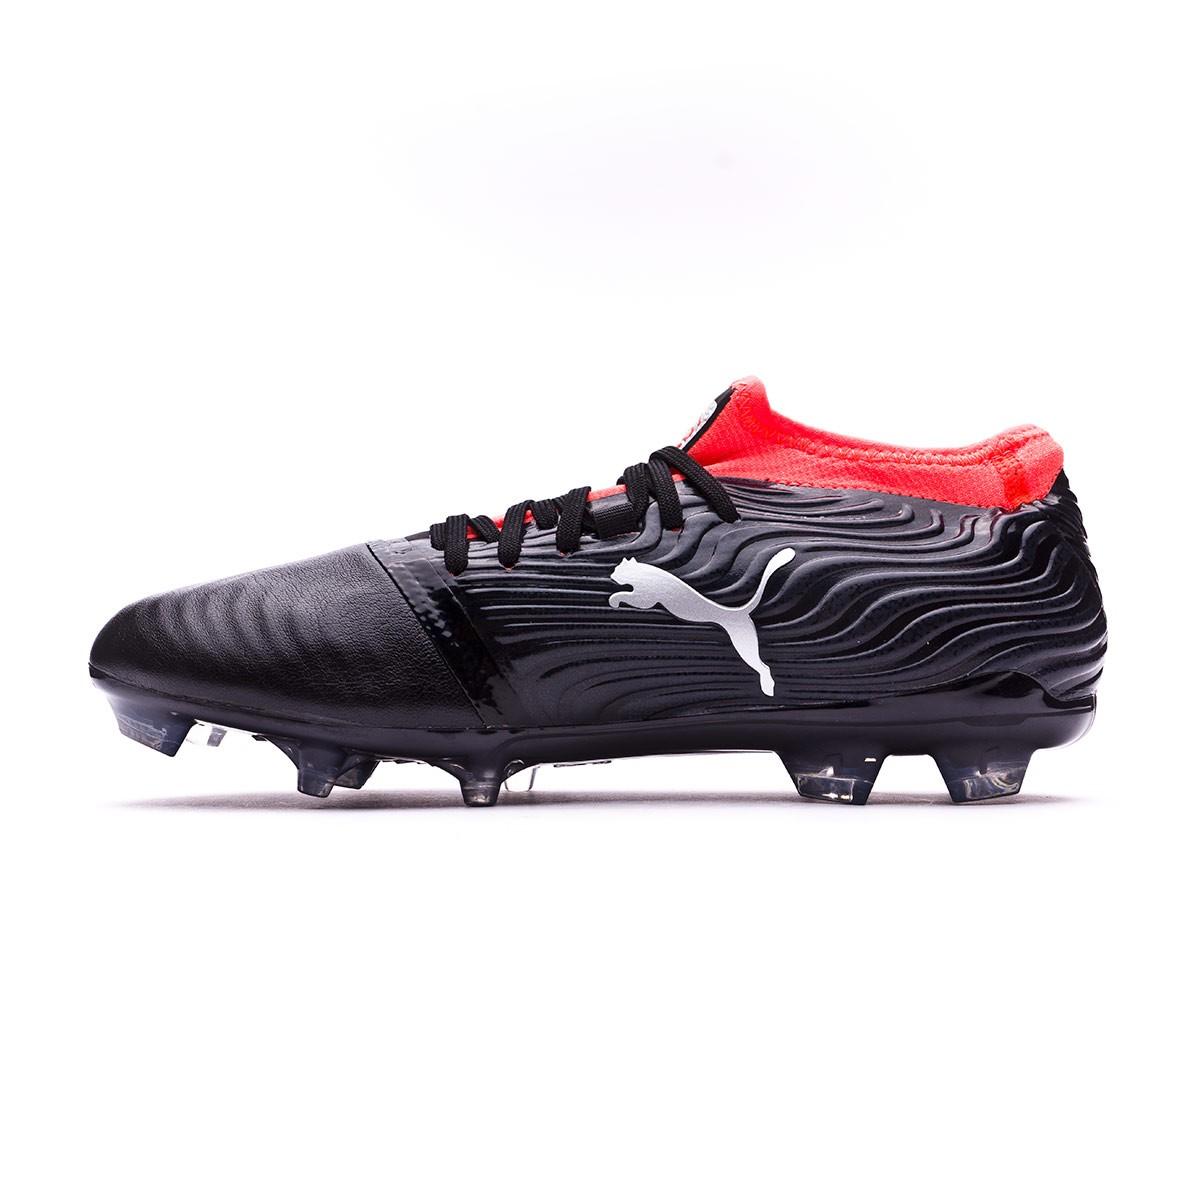 Boot Puma One 18.2 FG Puma Black-Puma Silver-Red Blast - Football store  Fútbol Emotion 3b6b0f356